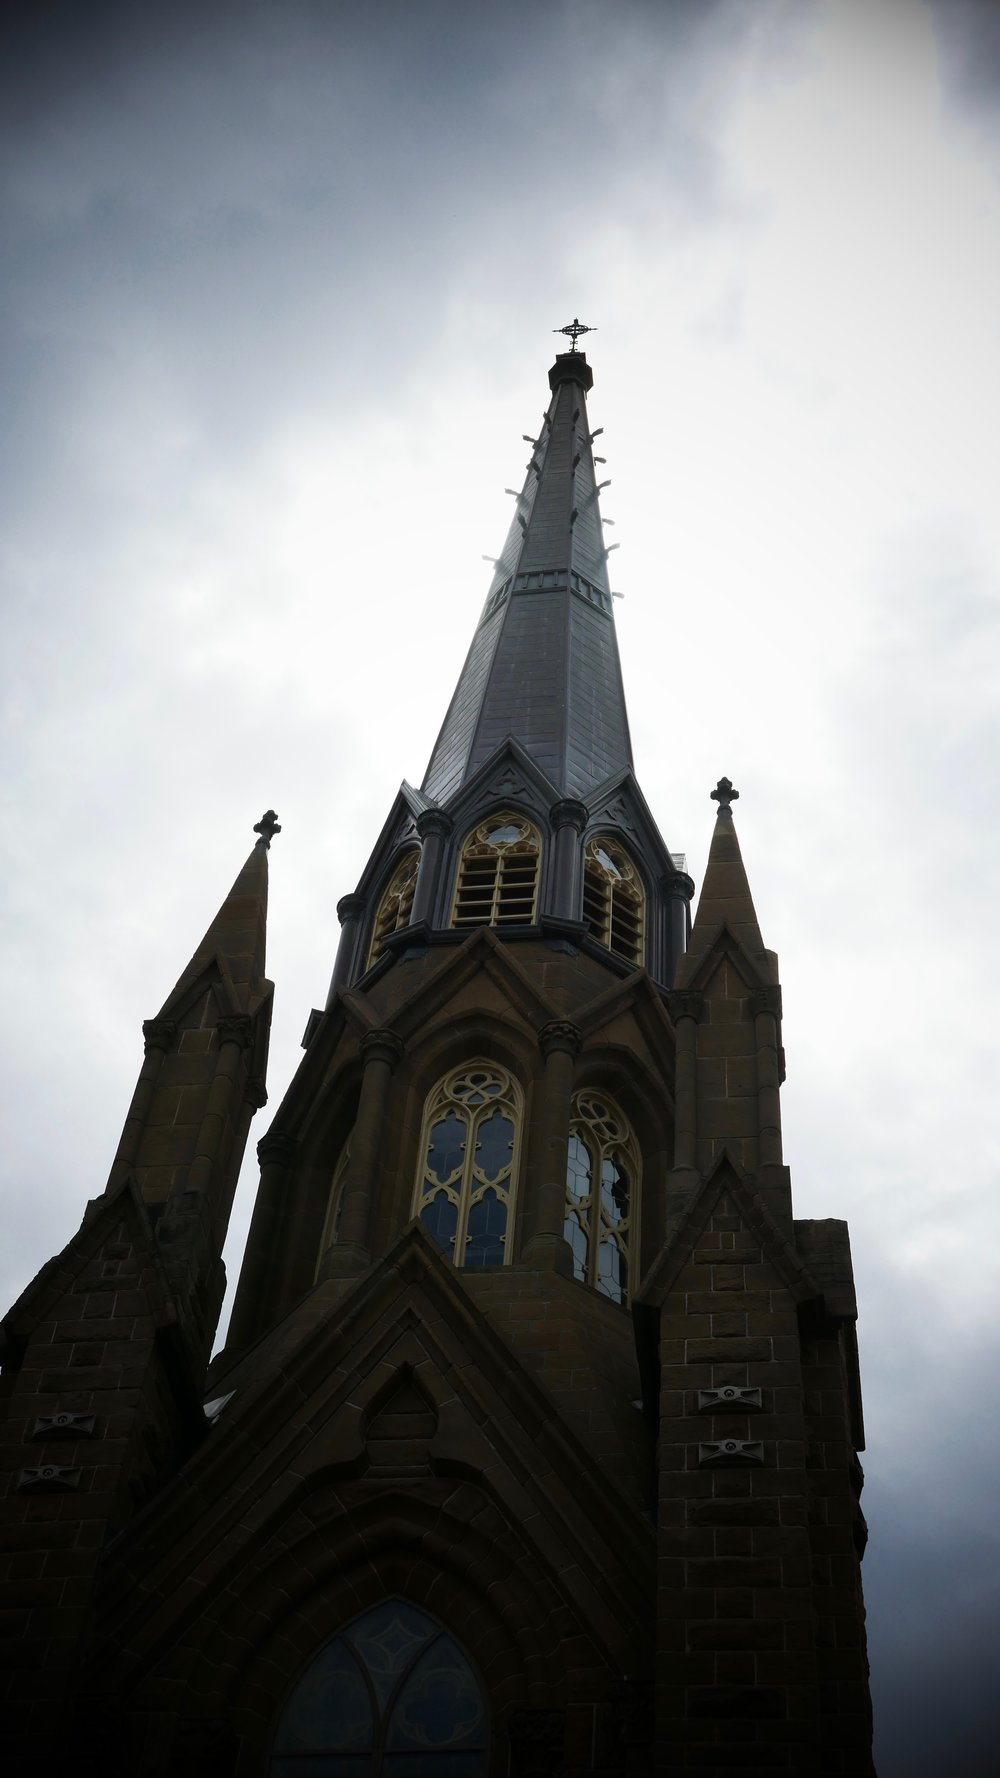 St. Dunstan's Bassilica in Charlottetown